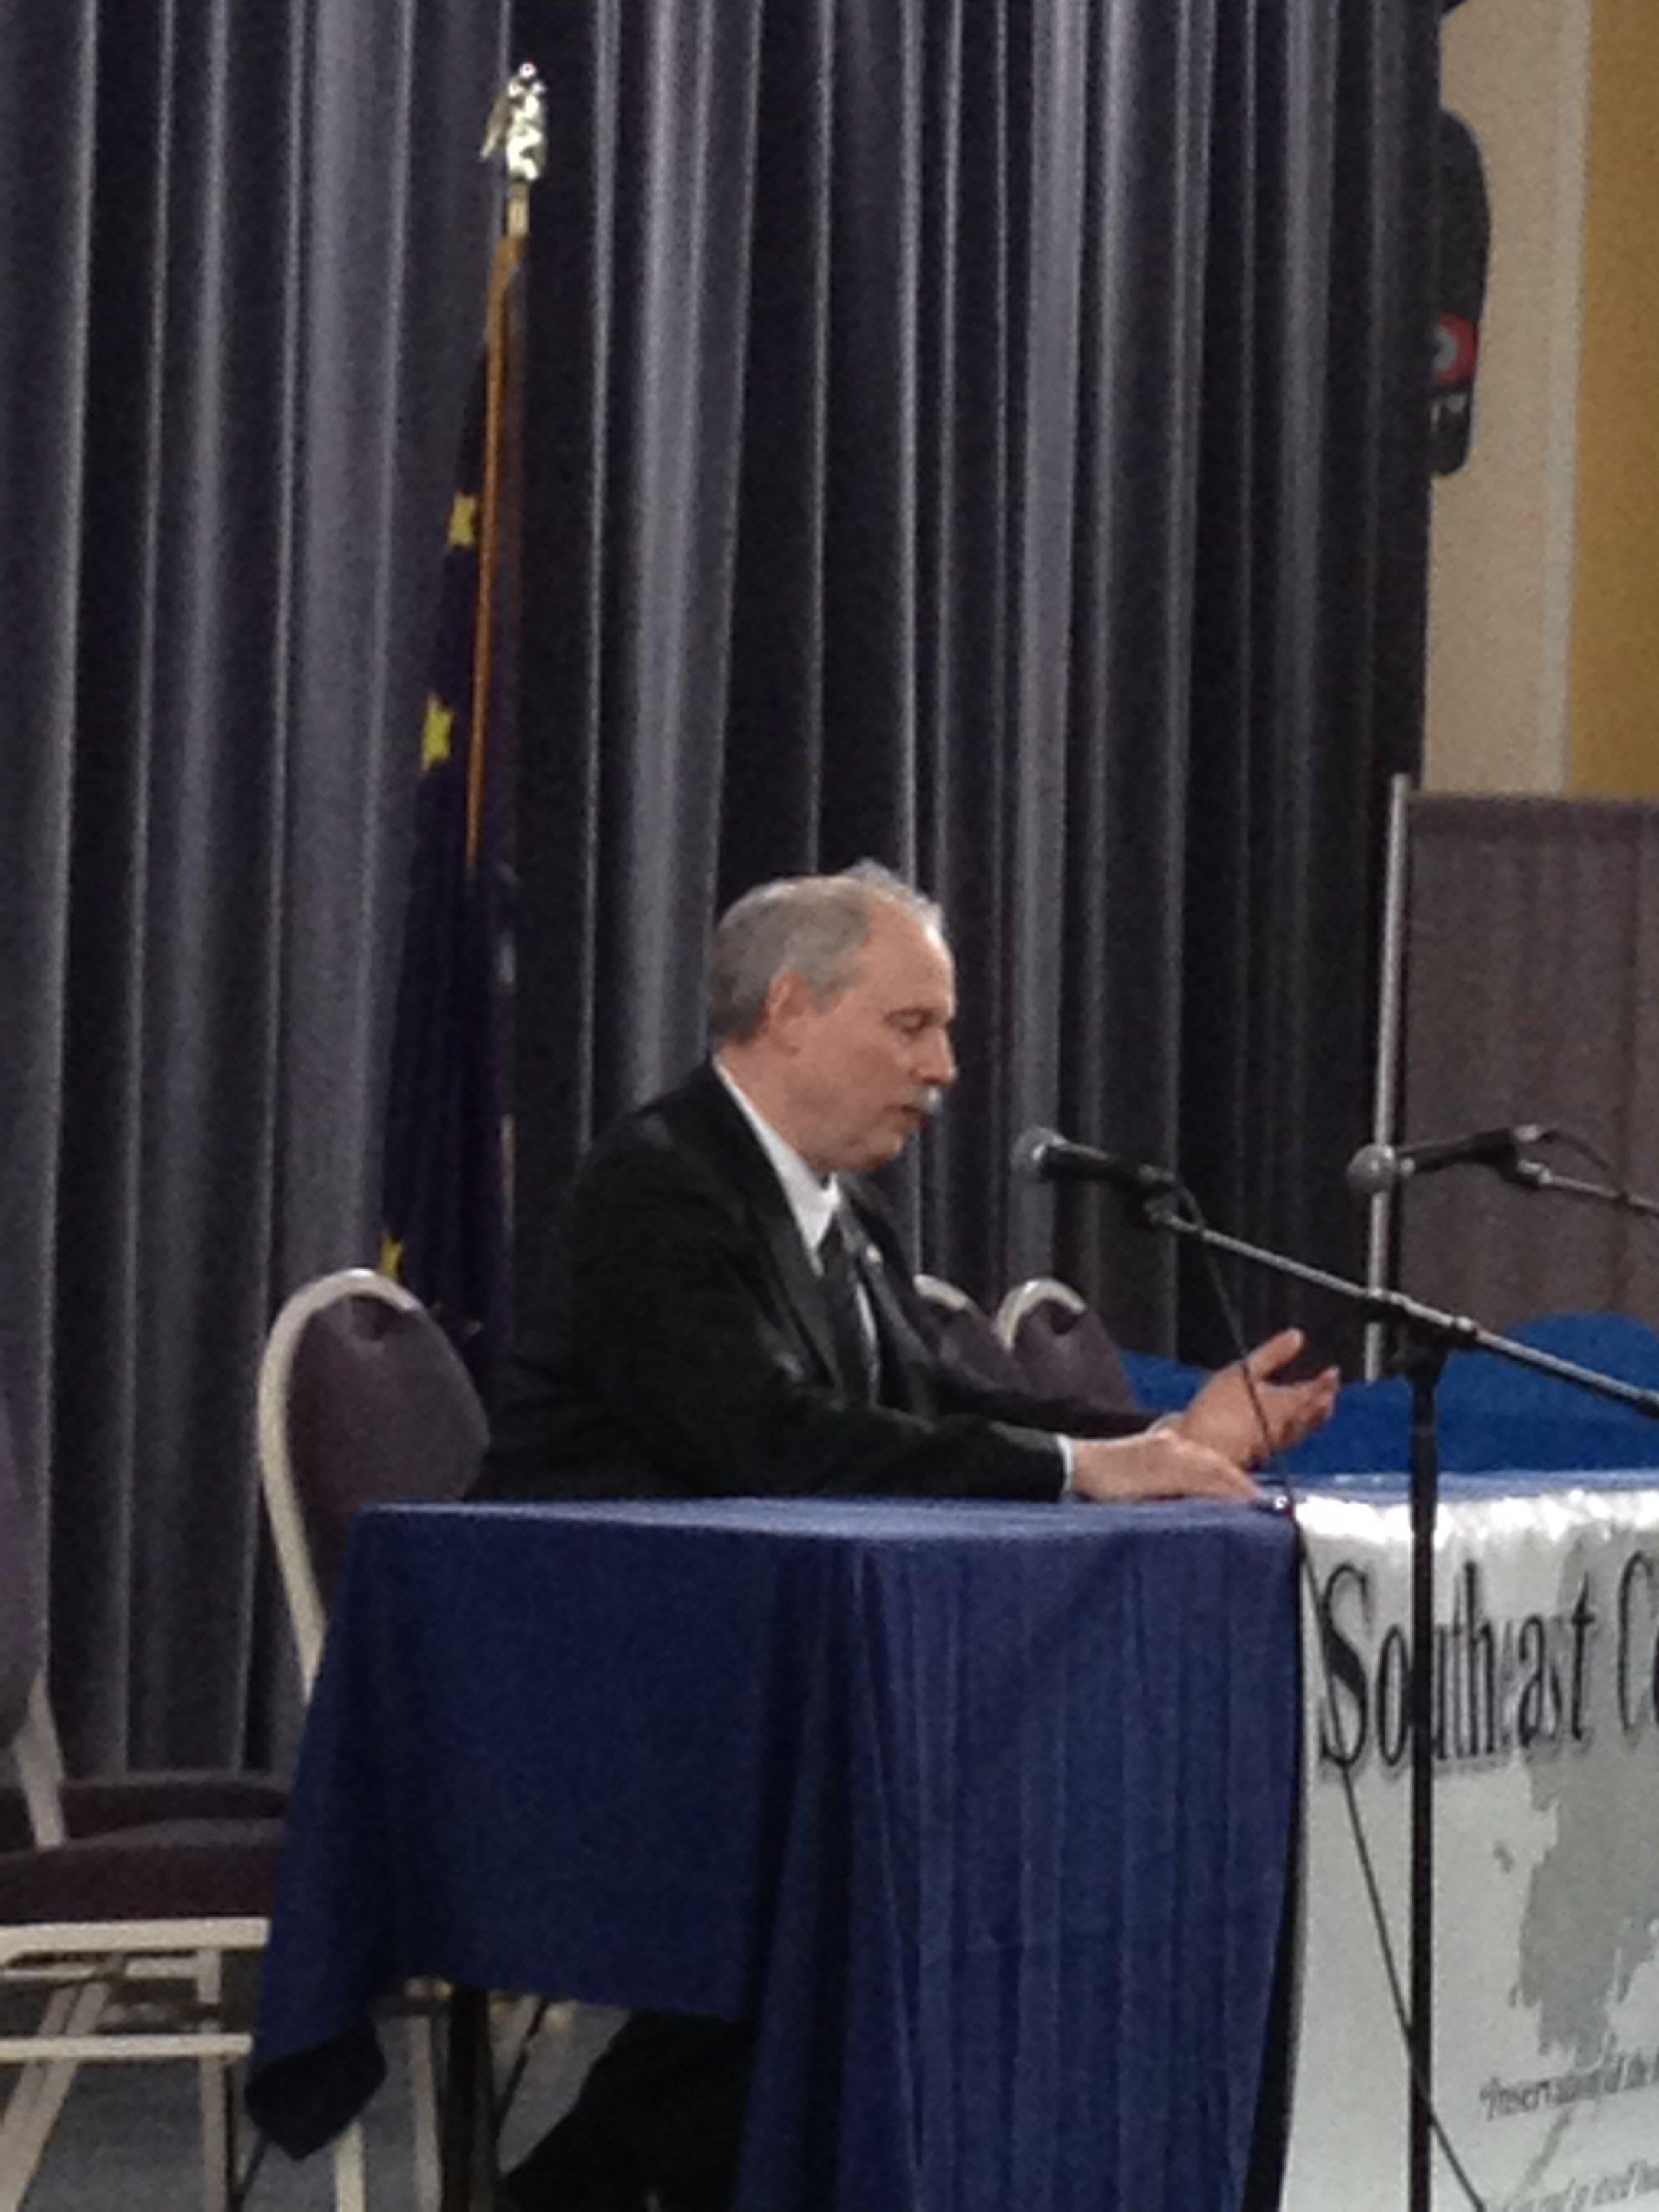 Senator Stedman addresses the Southeast Conference